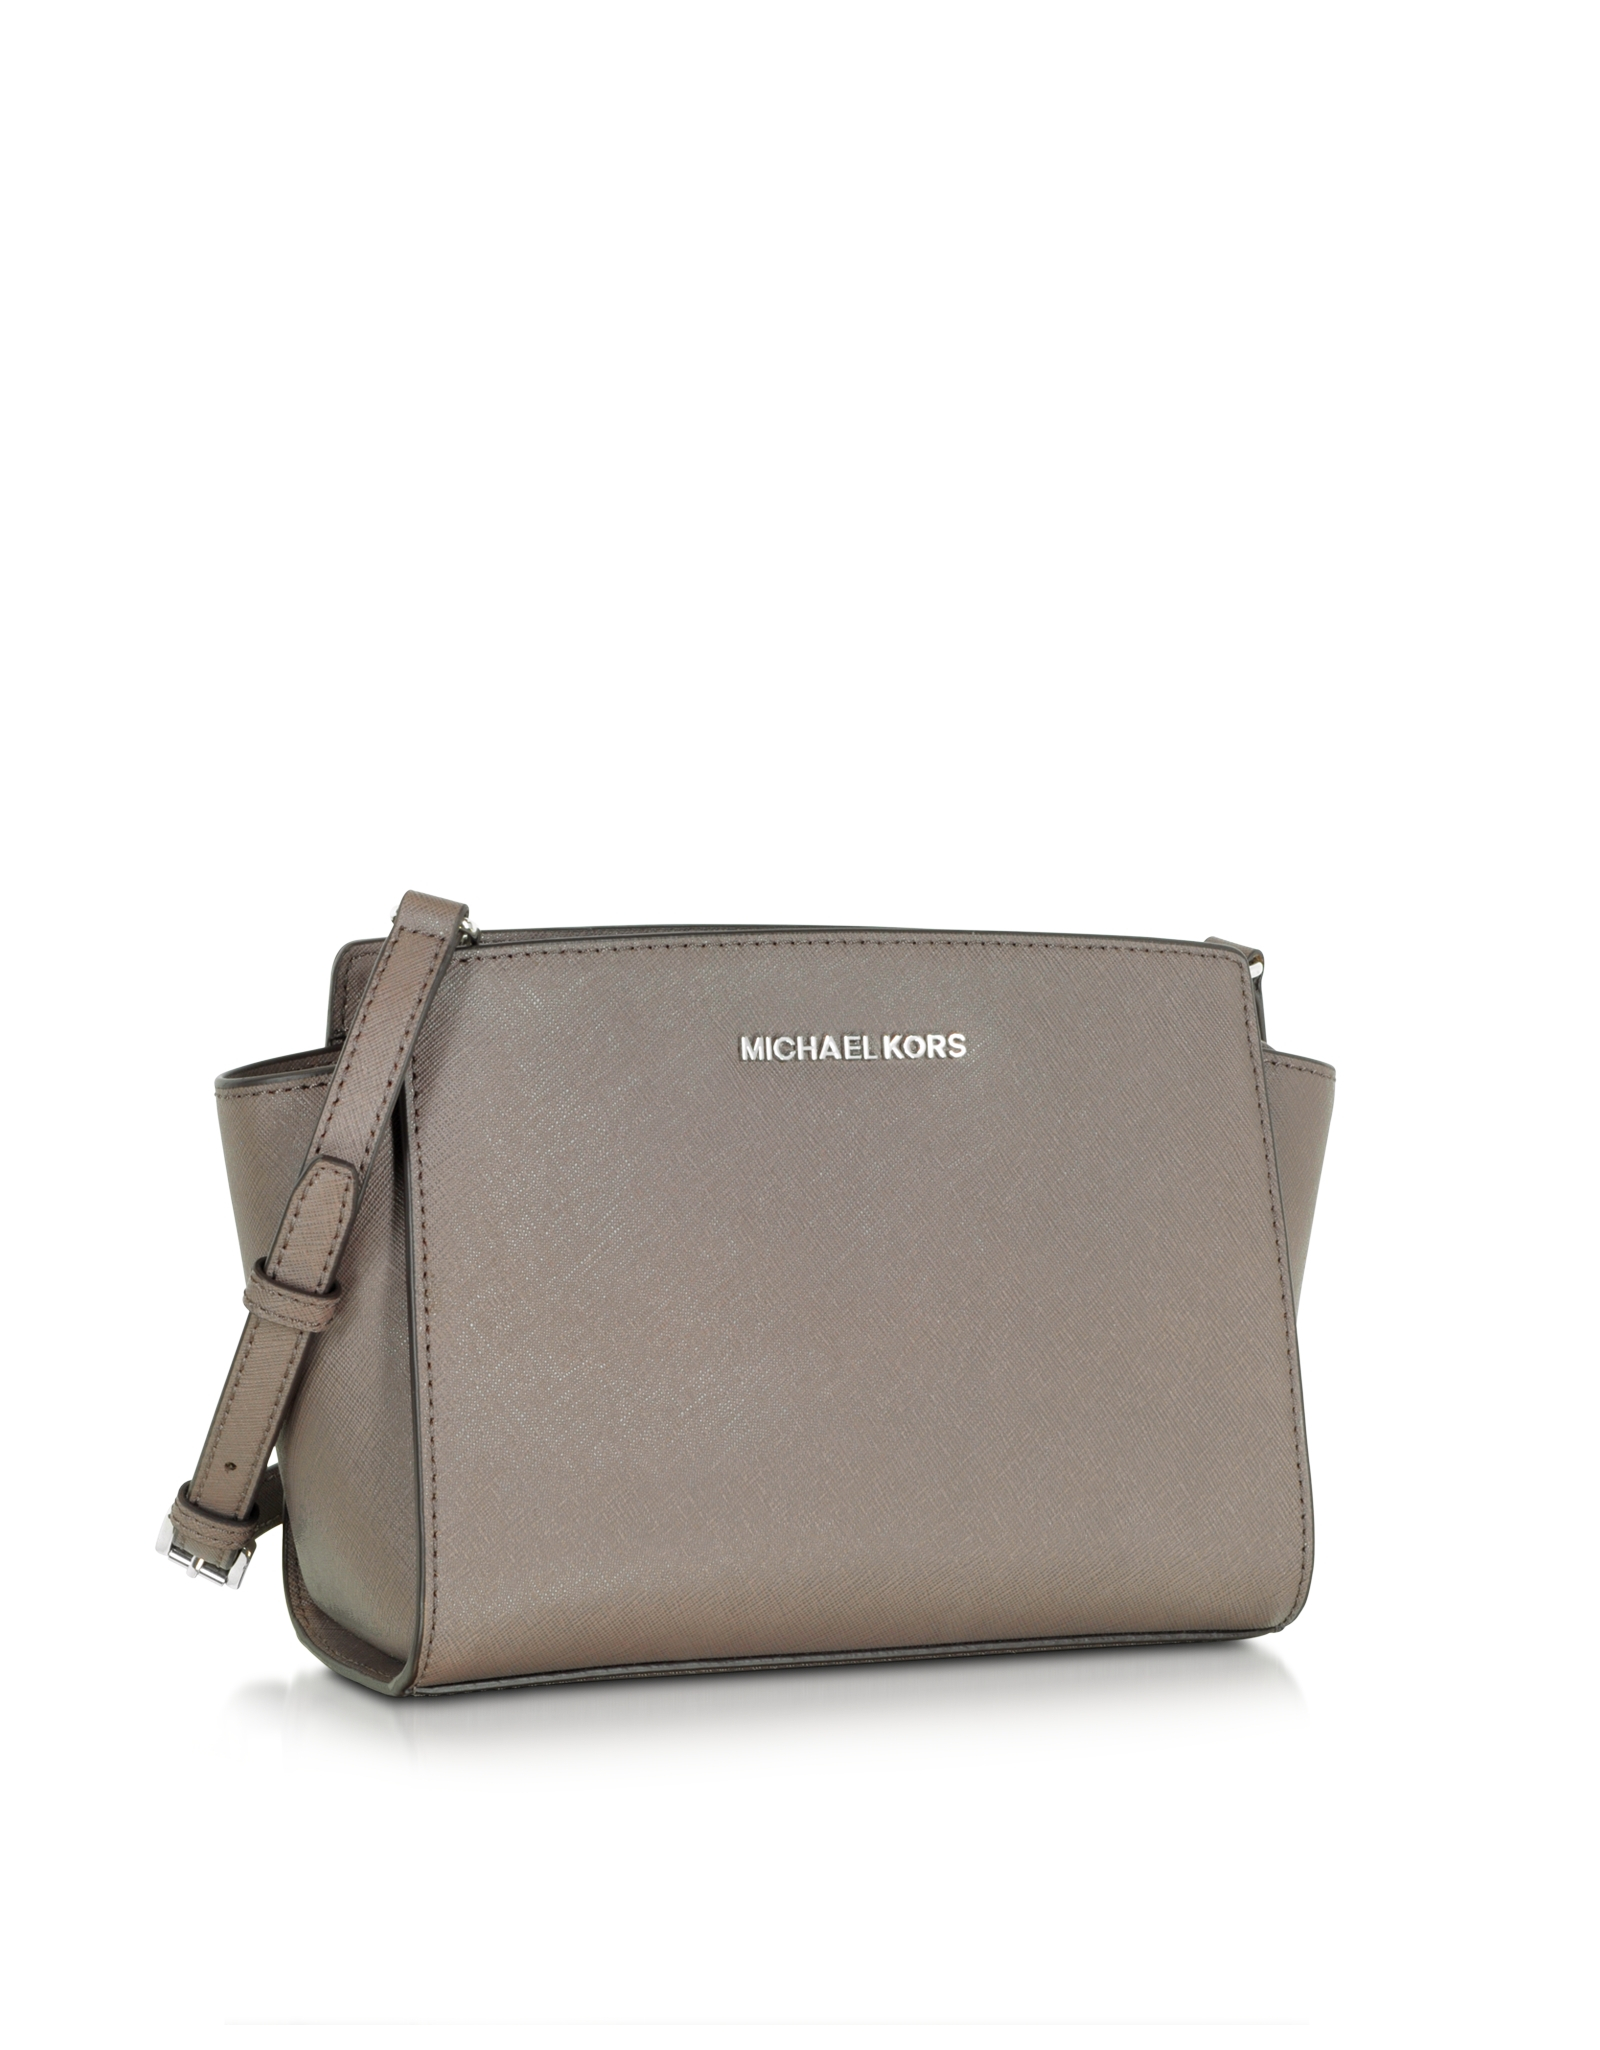 42cfabec0f7f64 Michael Kors Selma Saffiano-Leather Cross-Body Bag in Metallic - Lyst